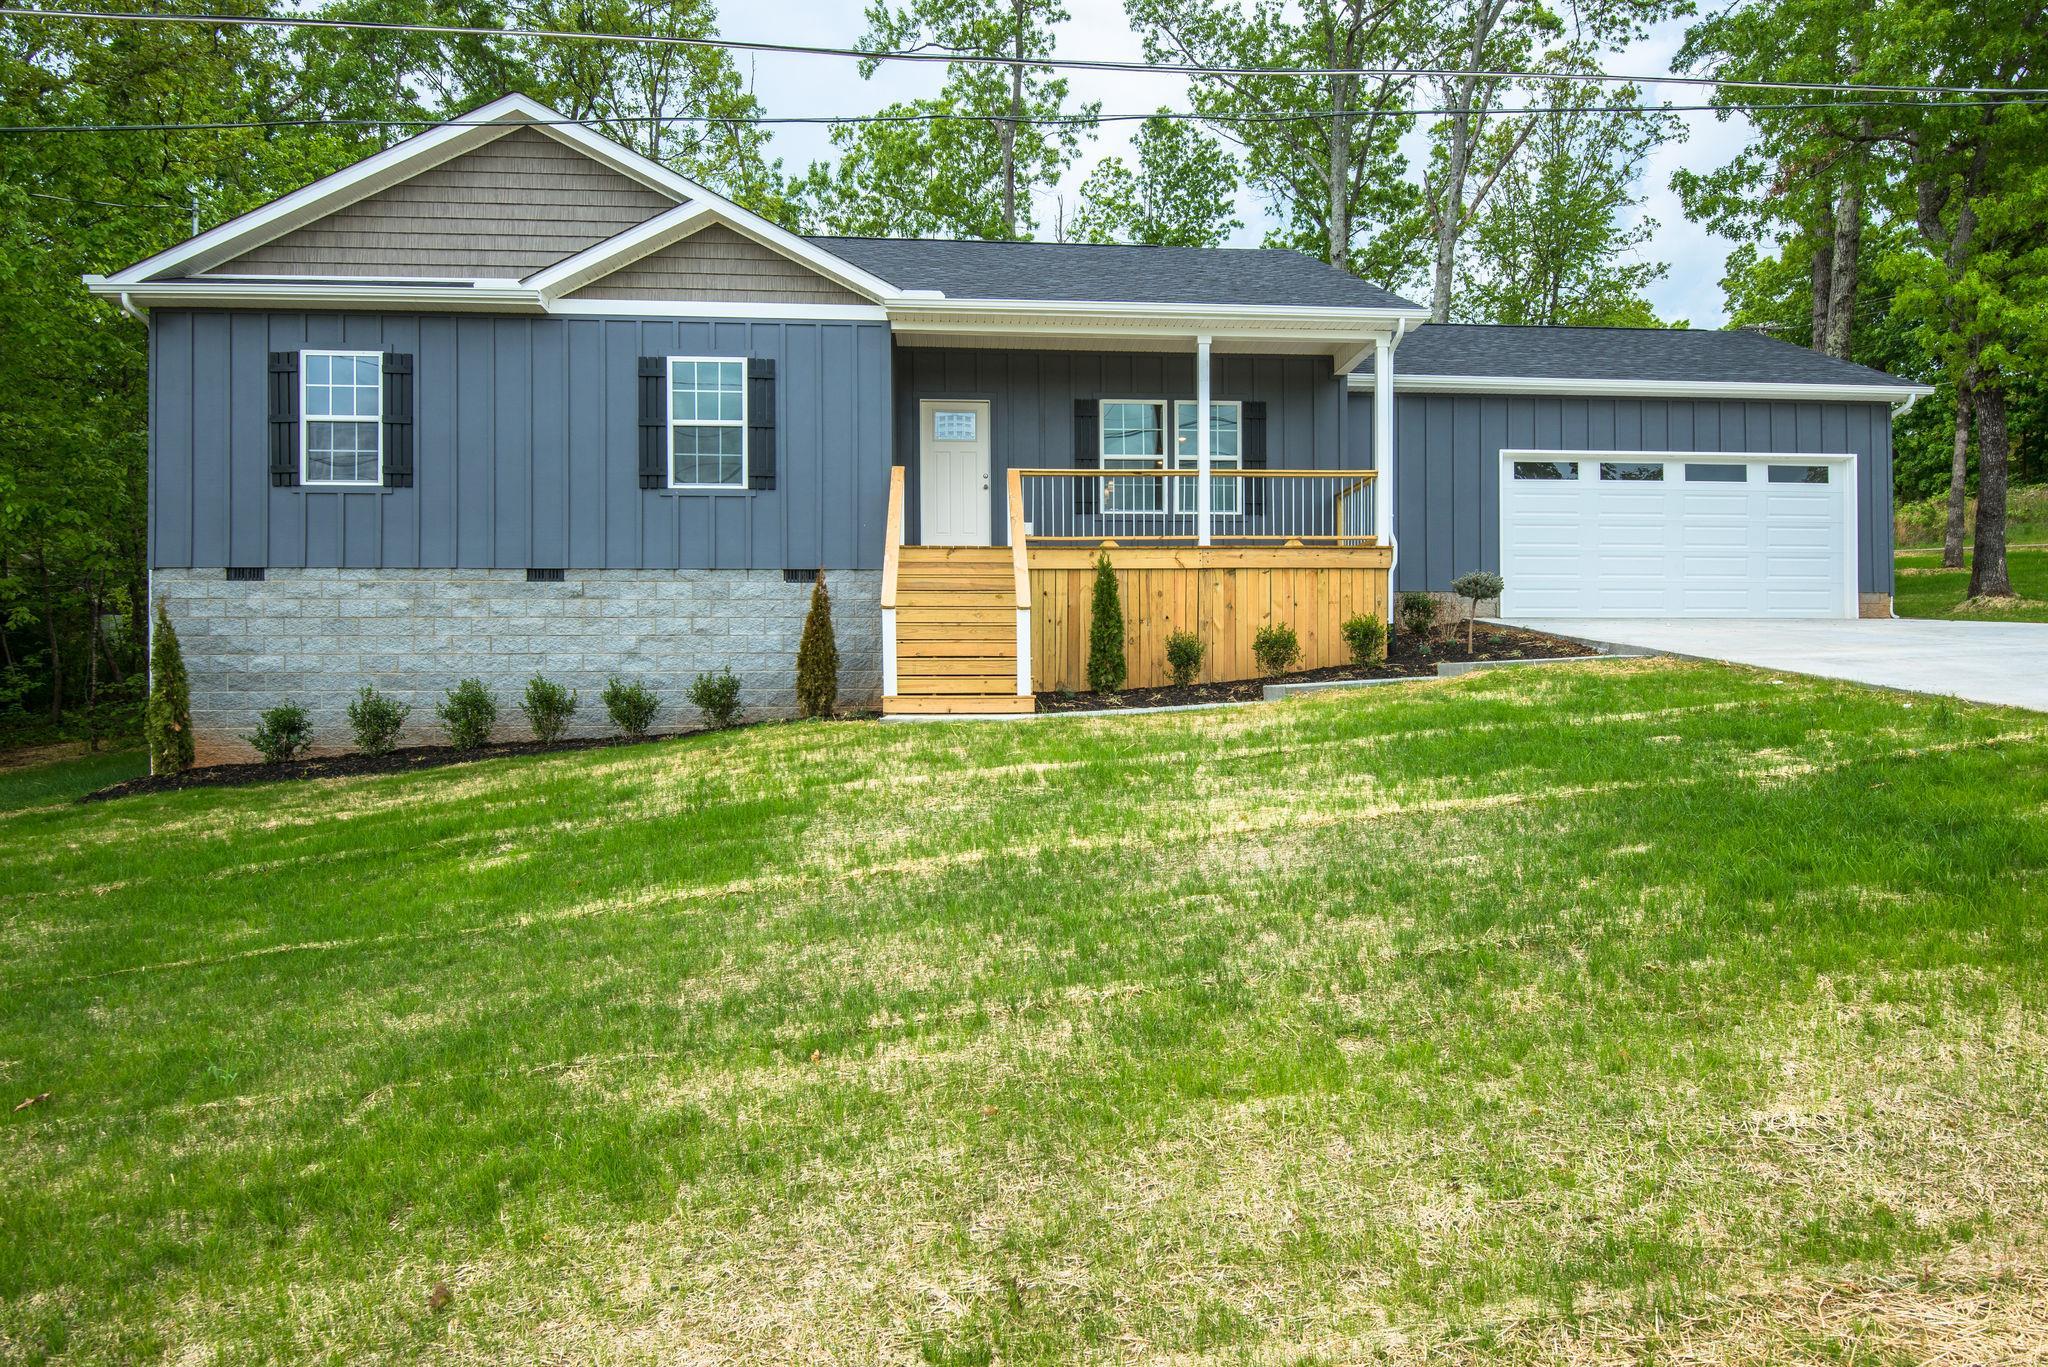 1002 Edgewood Drive, Dickson, TN 37055 - Dickson, TN real estate listing